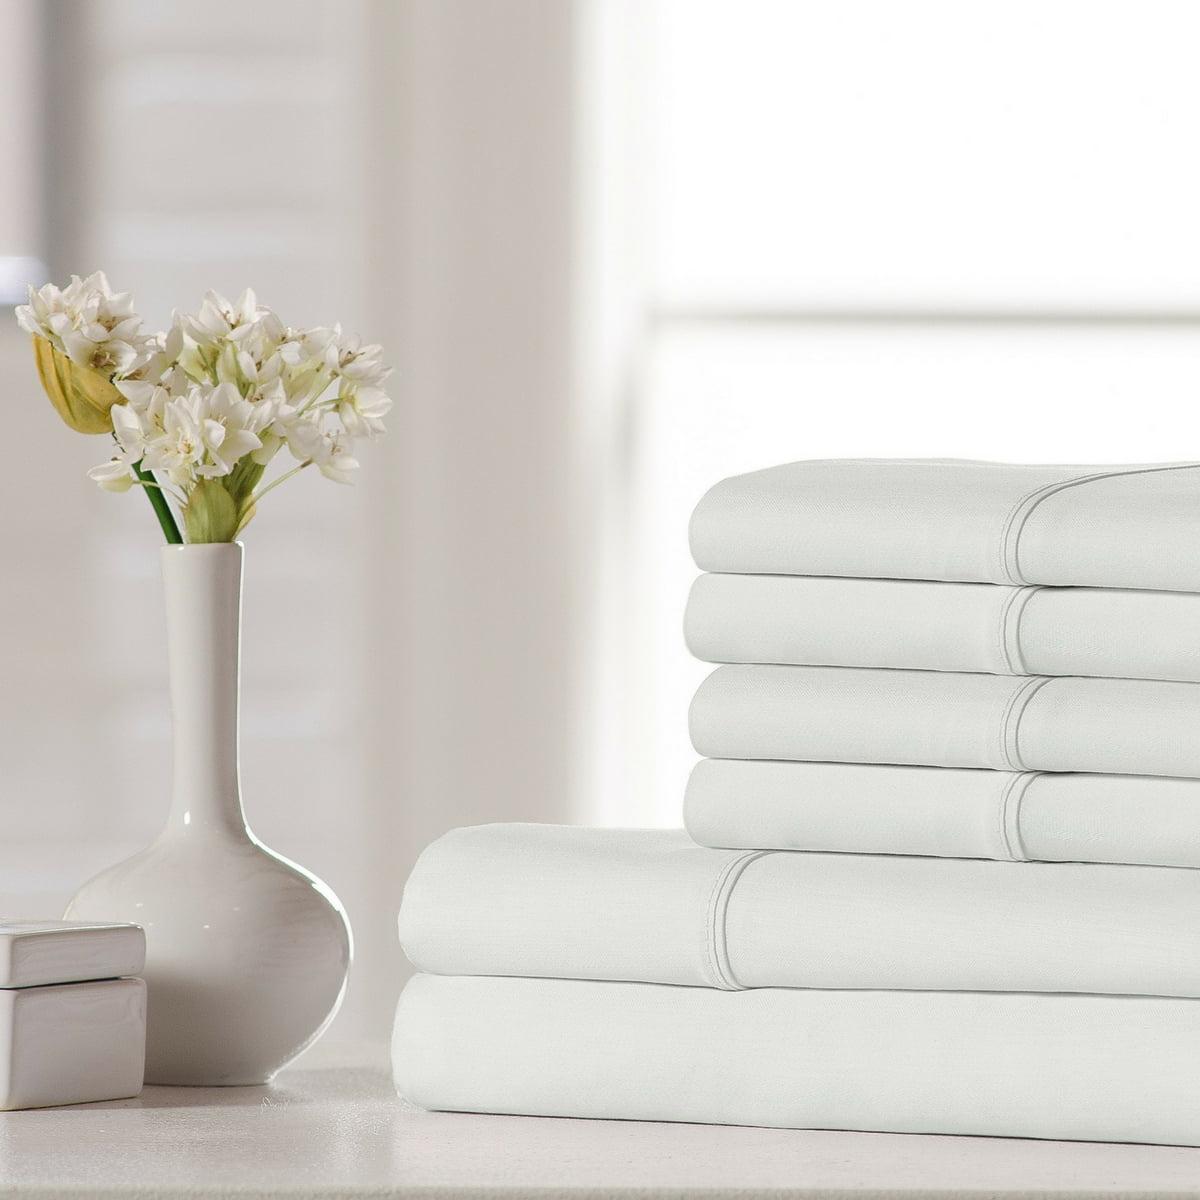 500-Thread Count 100% Cotton 6-Piece Sheet Set